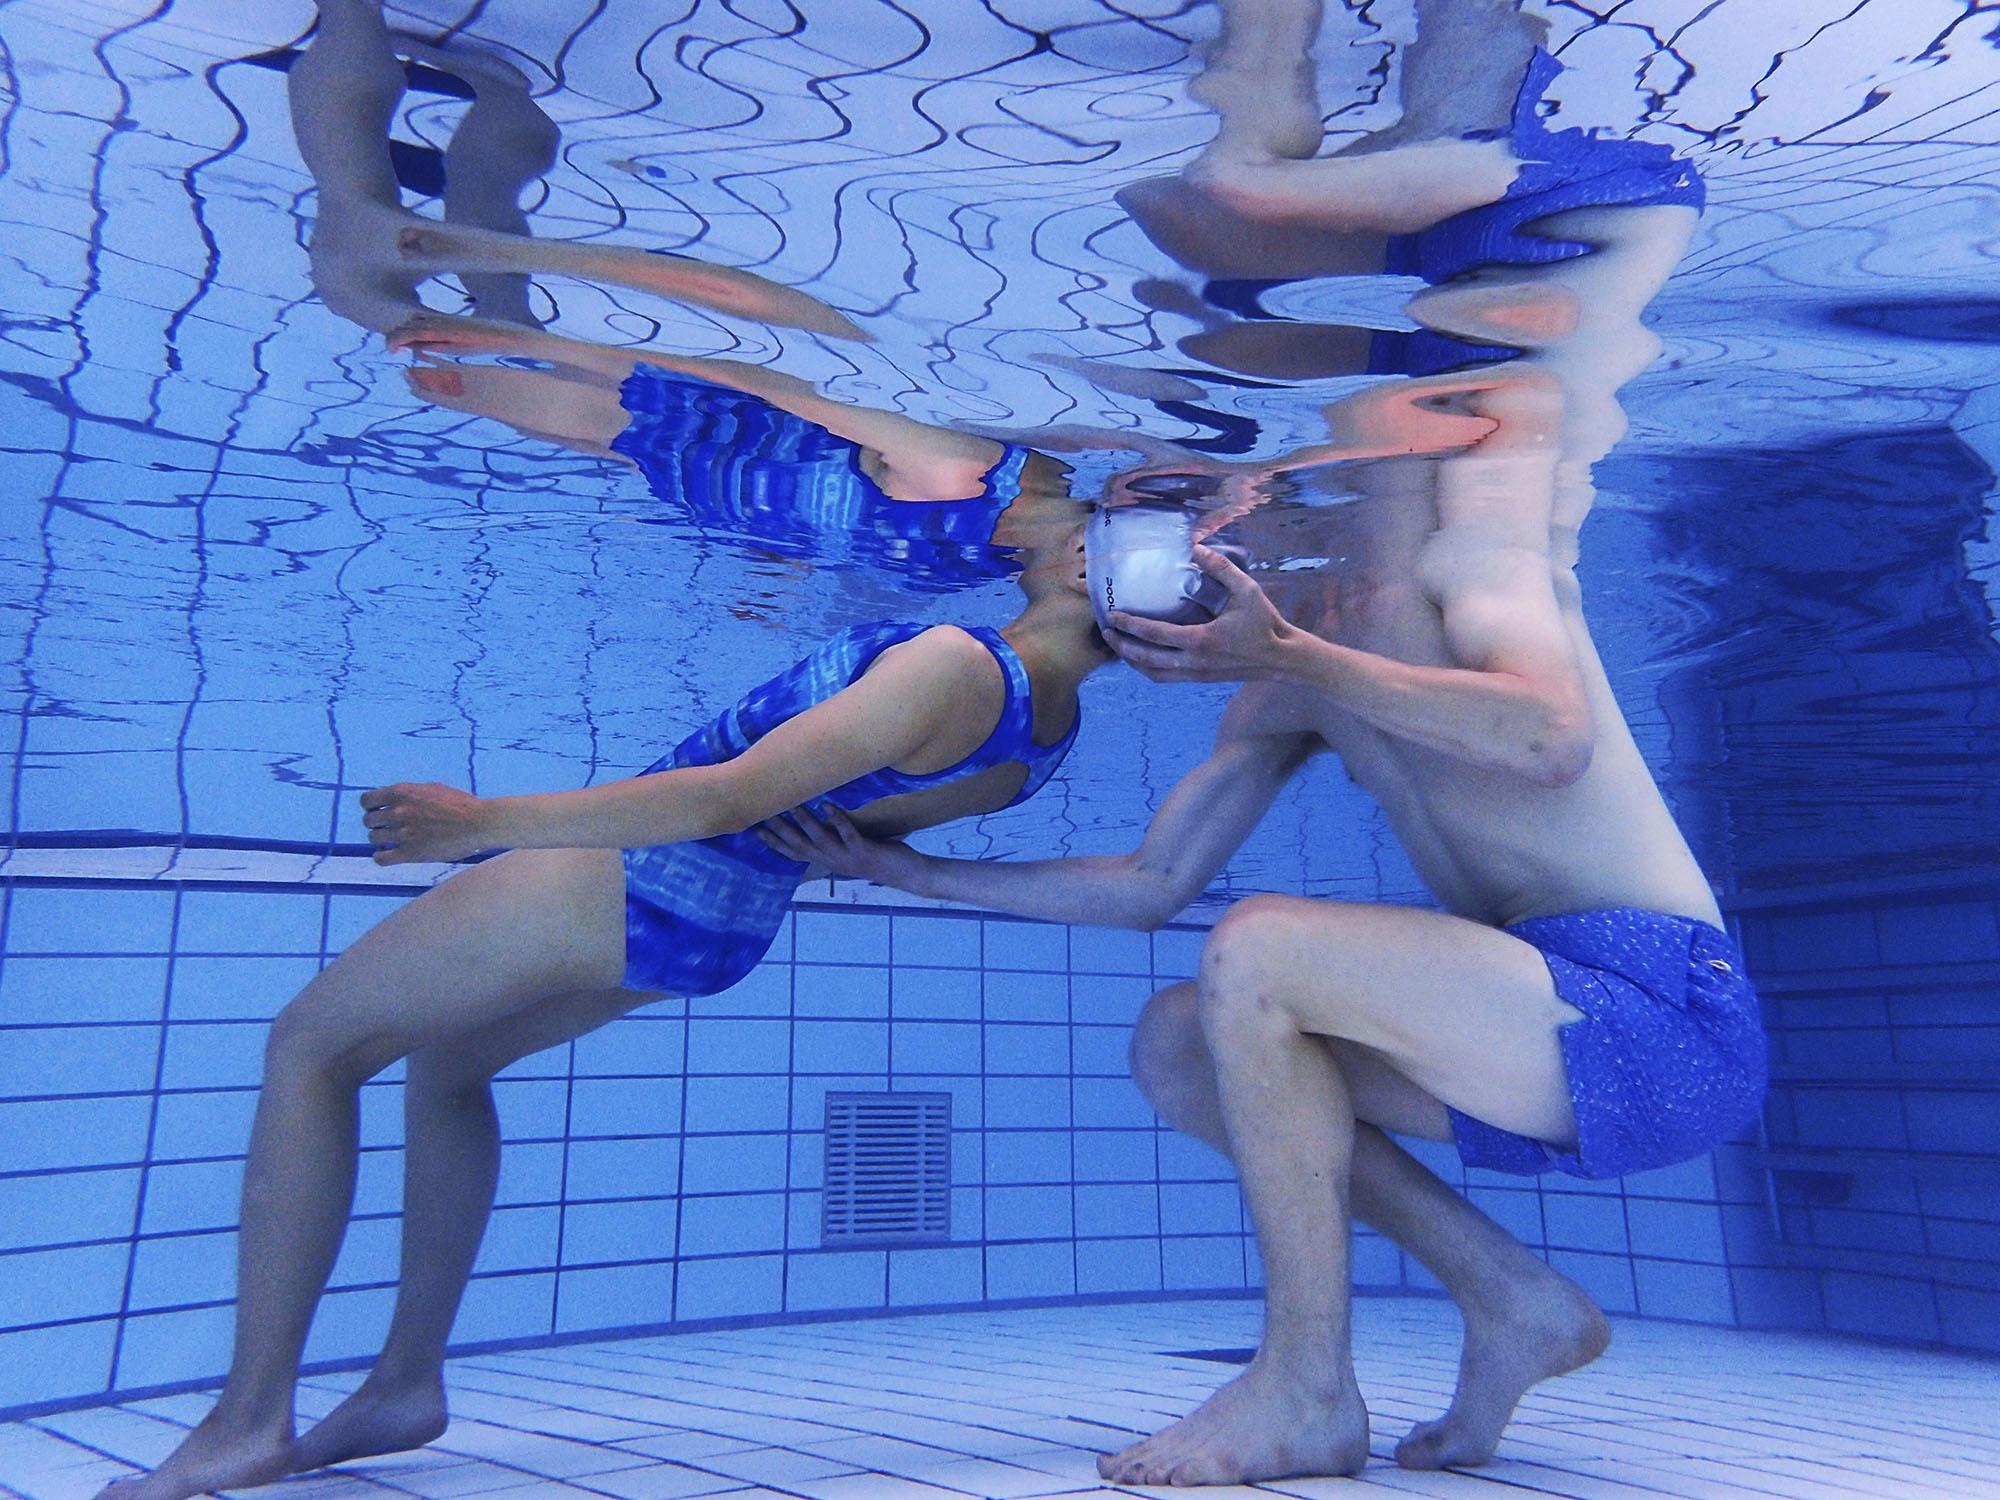 2017-09-19_59c0e900ef64f_WaterBodies5